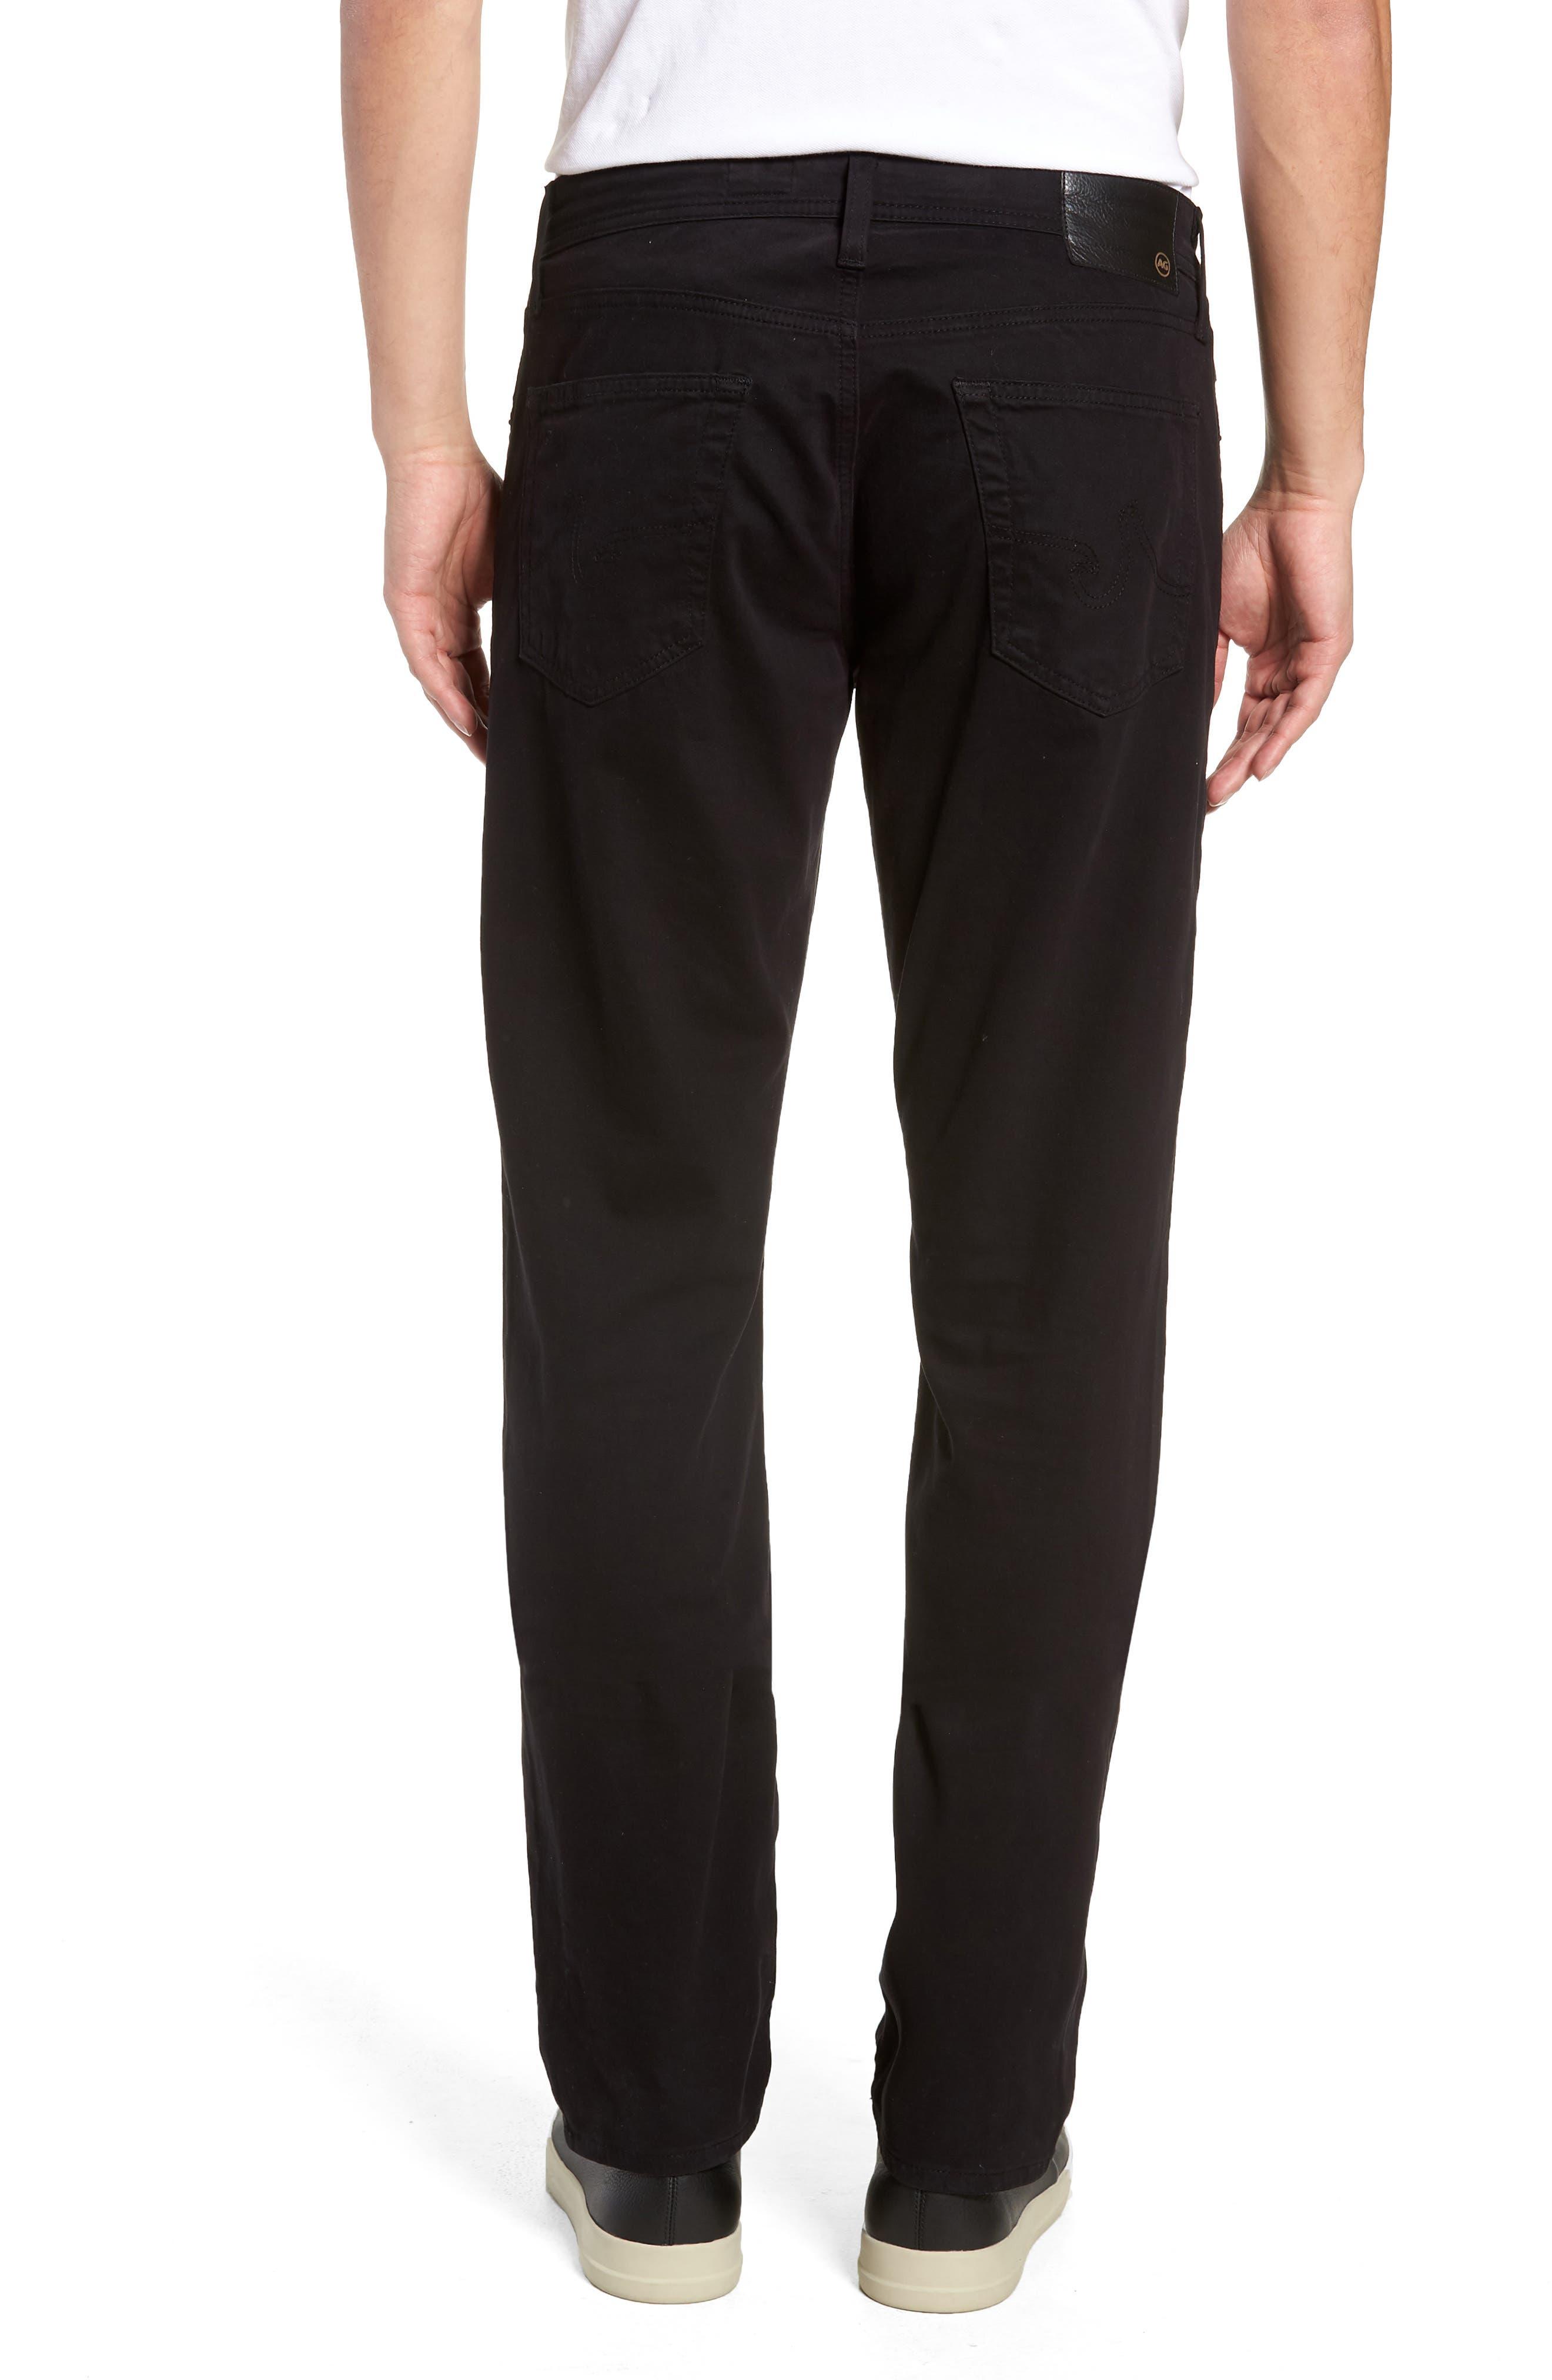 Graduate SUD Slim Straight Leg Pants,                             Alternate thumbnail 3, color,                             BLACK